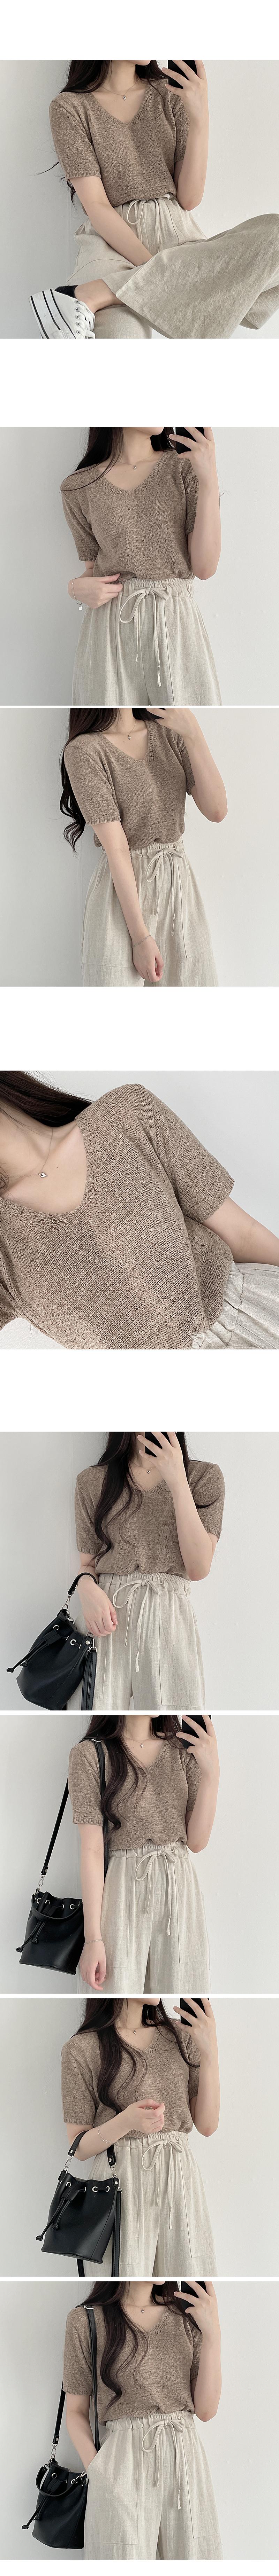 Ringsome Short Sleeve Knitwear